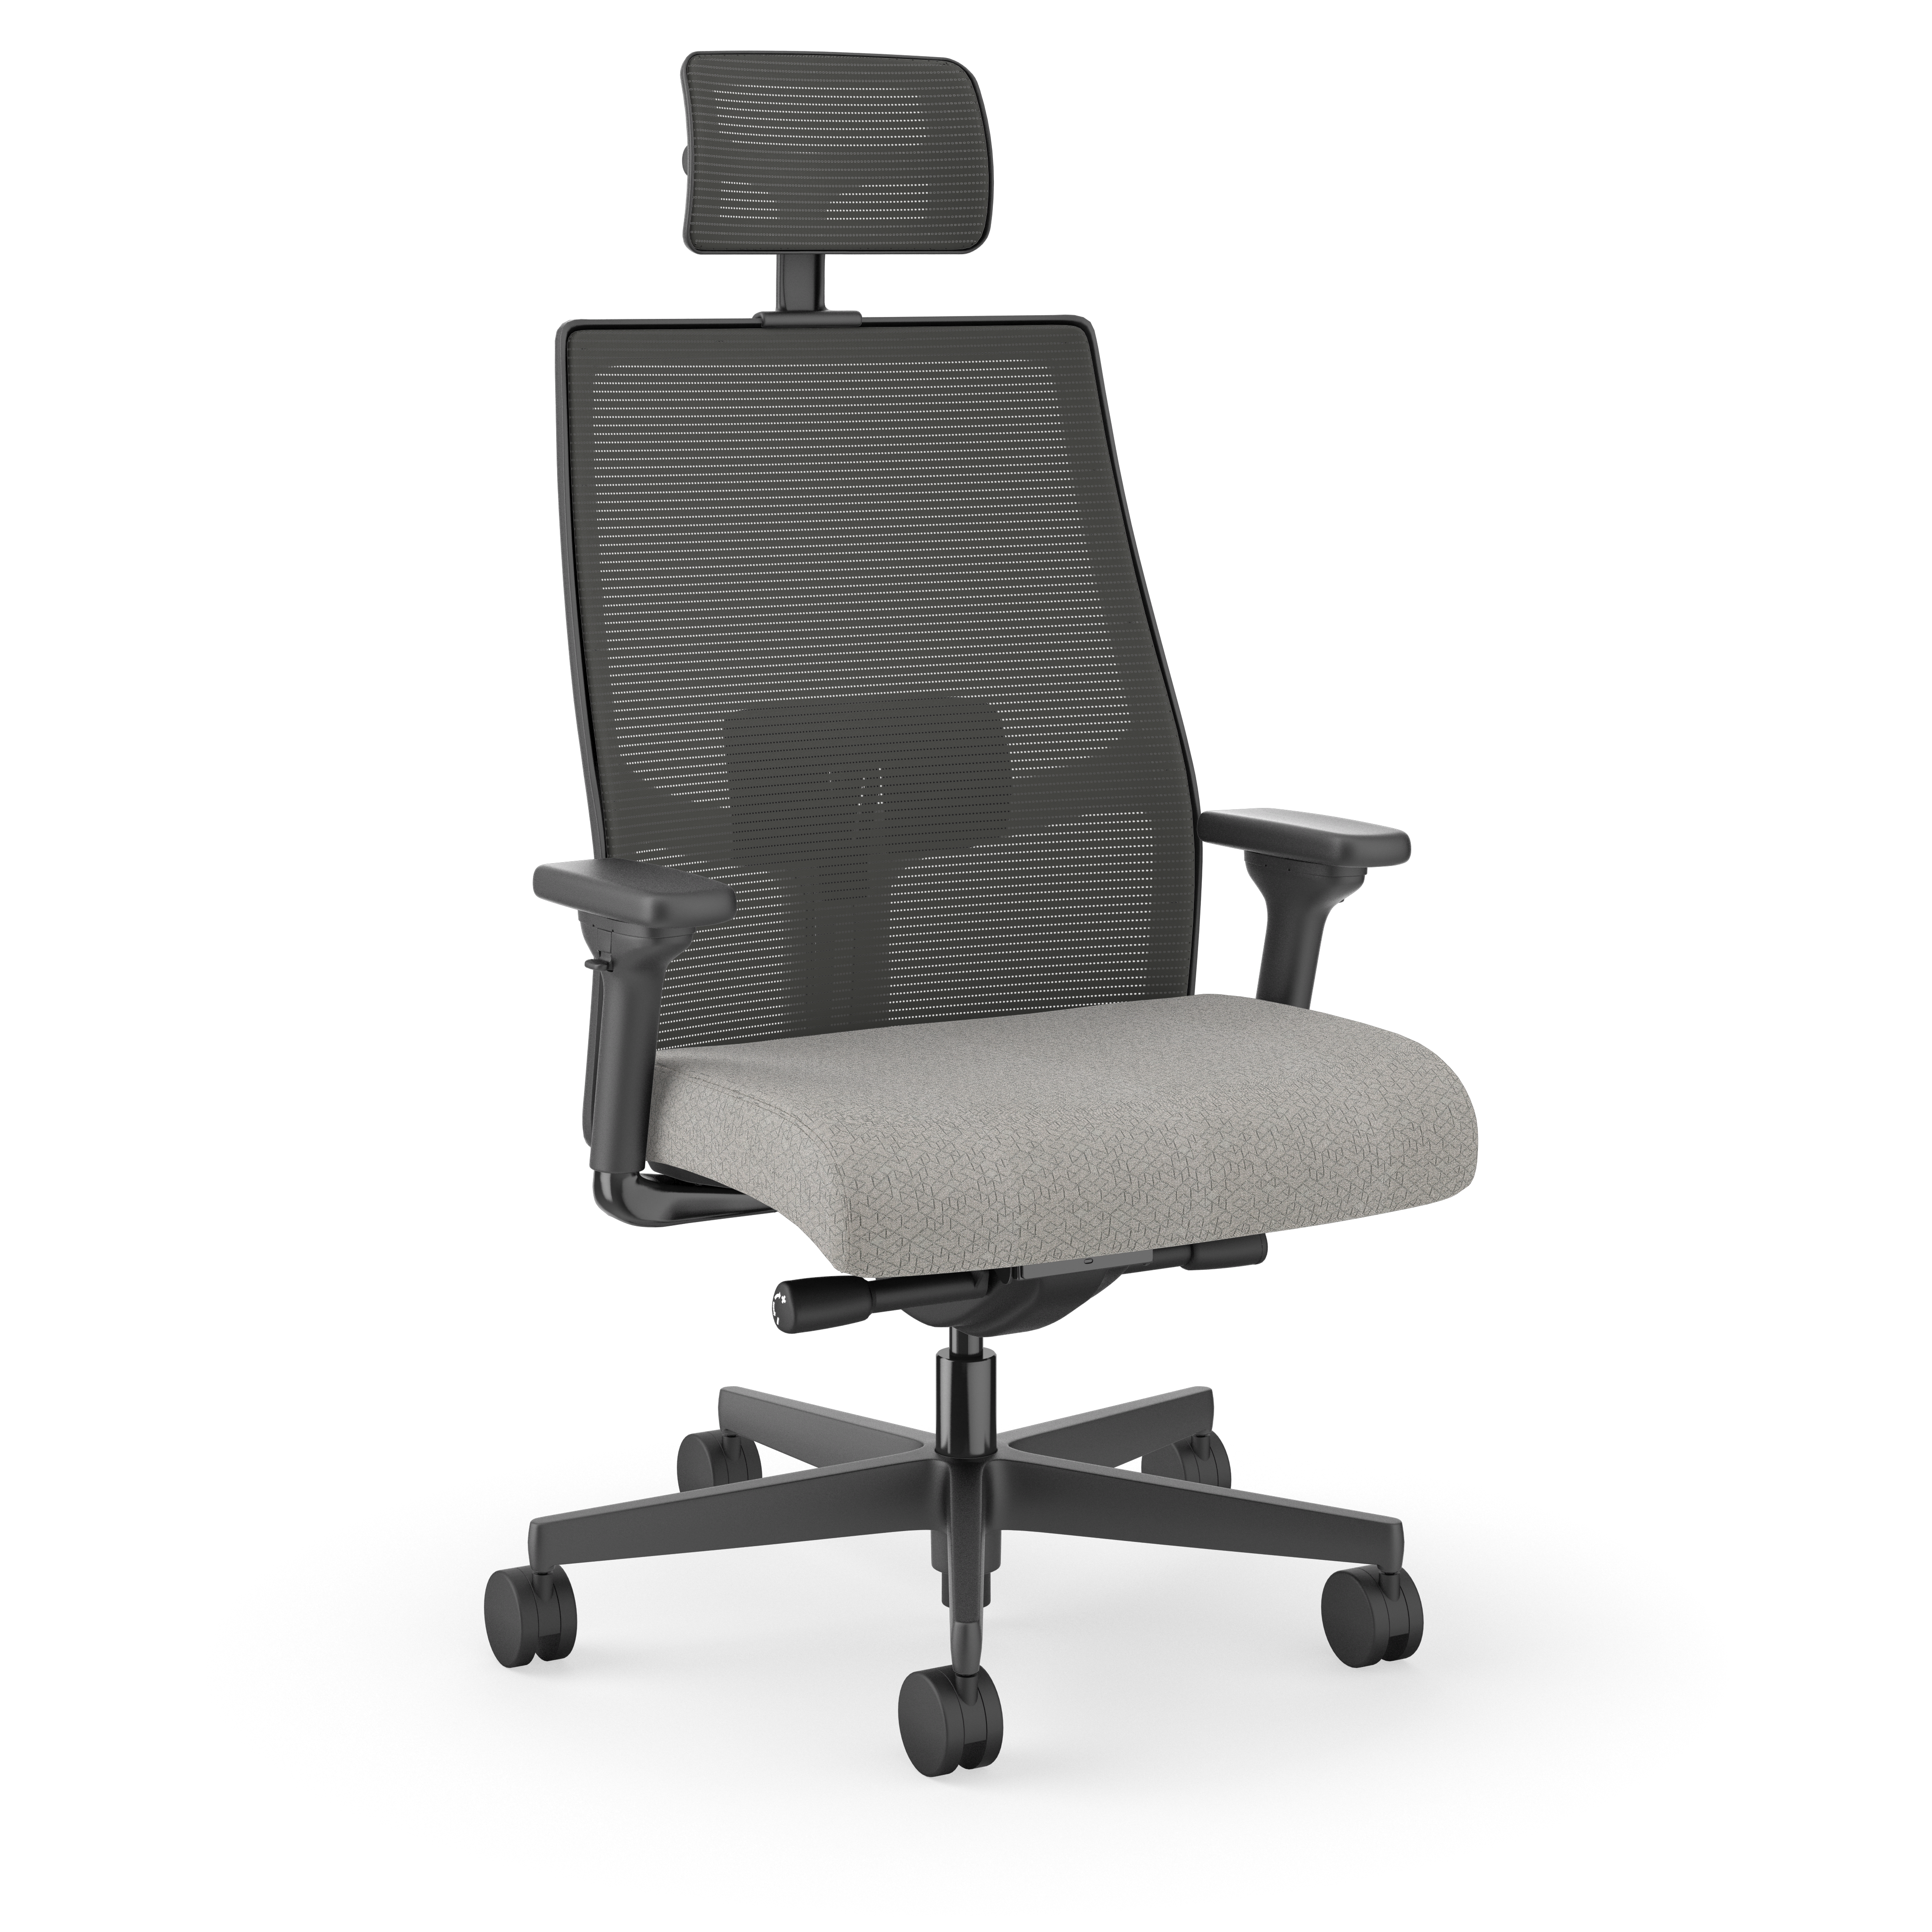 HON Ignition Big & Tall Task Chair HIWMBT.Y4.V.A.IC.APX29.BL.SB.T.HR